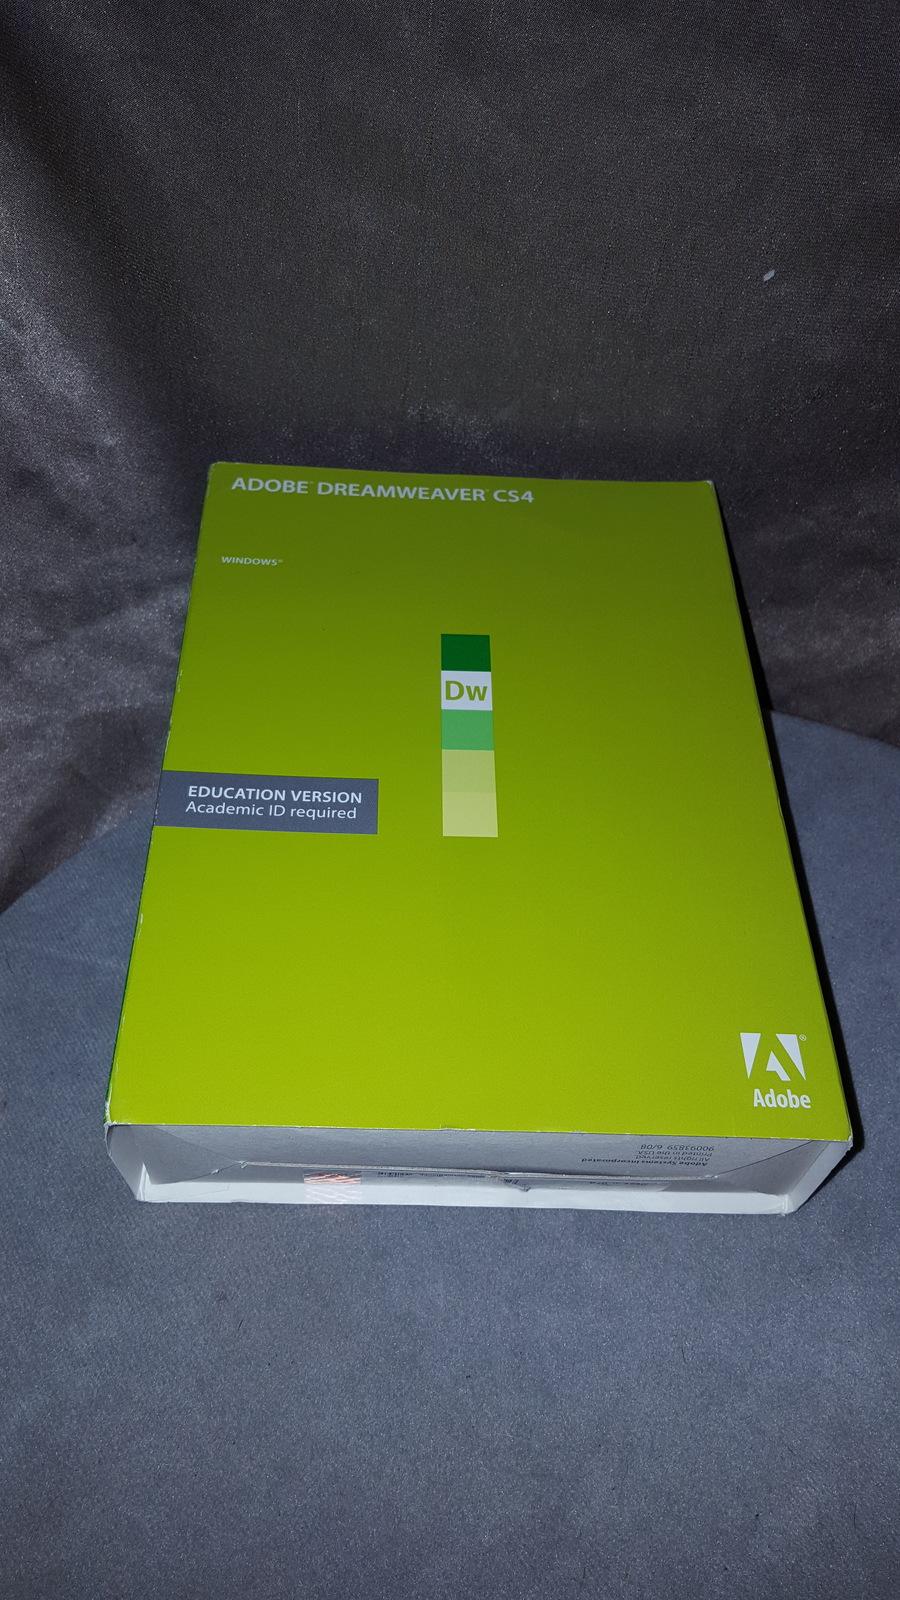 Adobe Dreamweaver CS4 for Windows - and 50 similar items